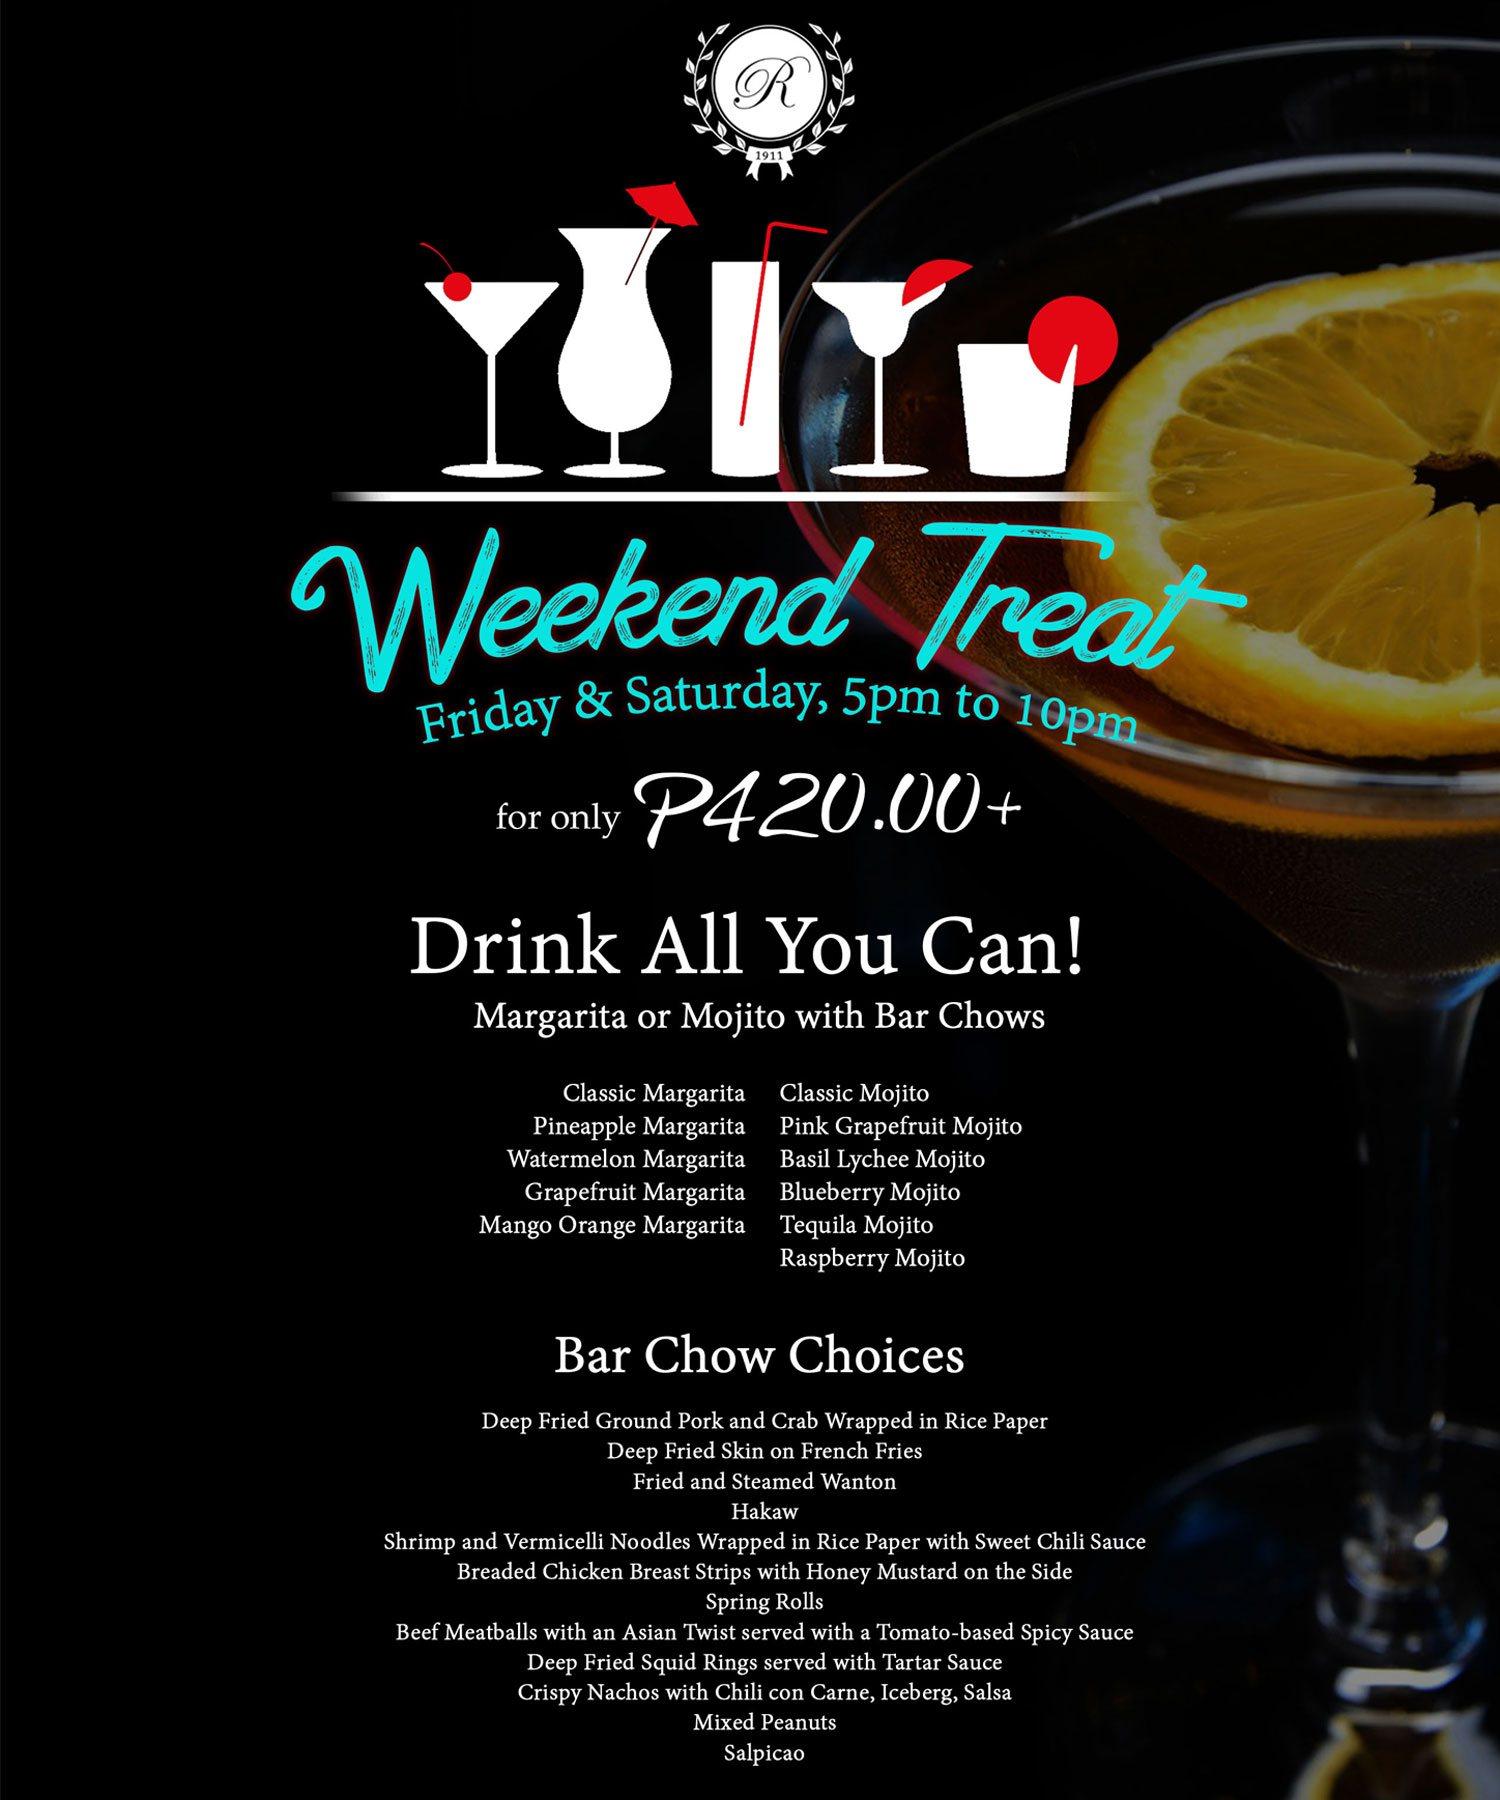 Rizal Park Hotel - Weekend Treat Promo